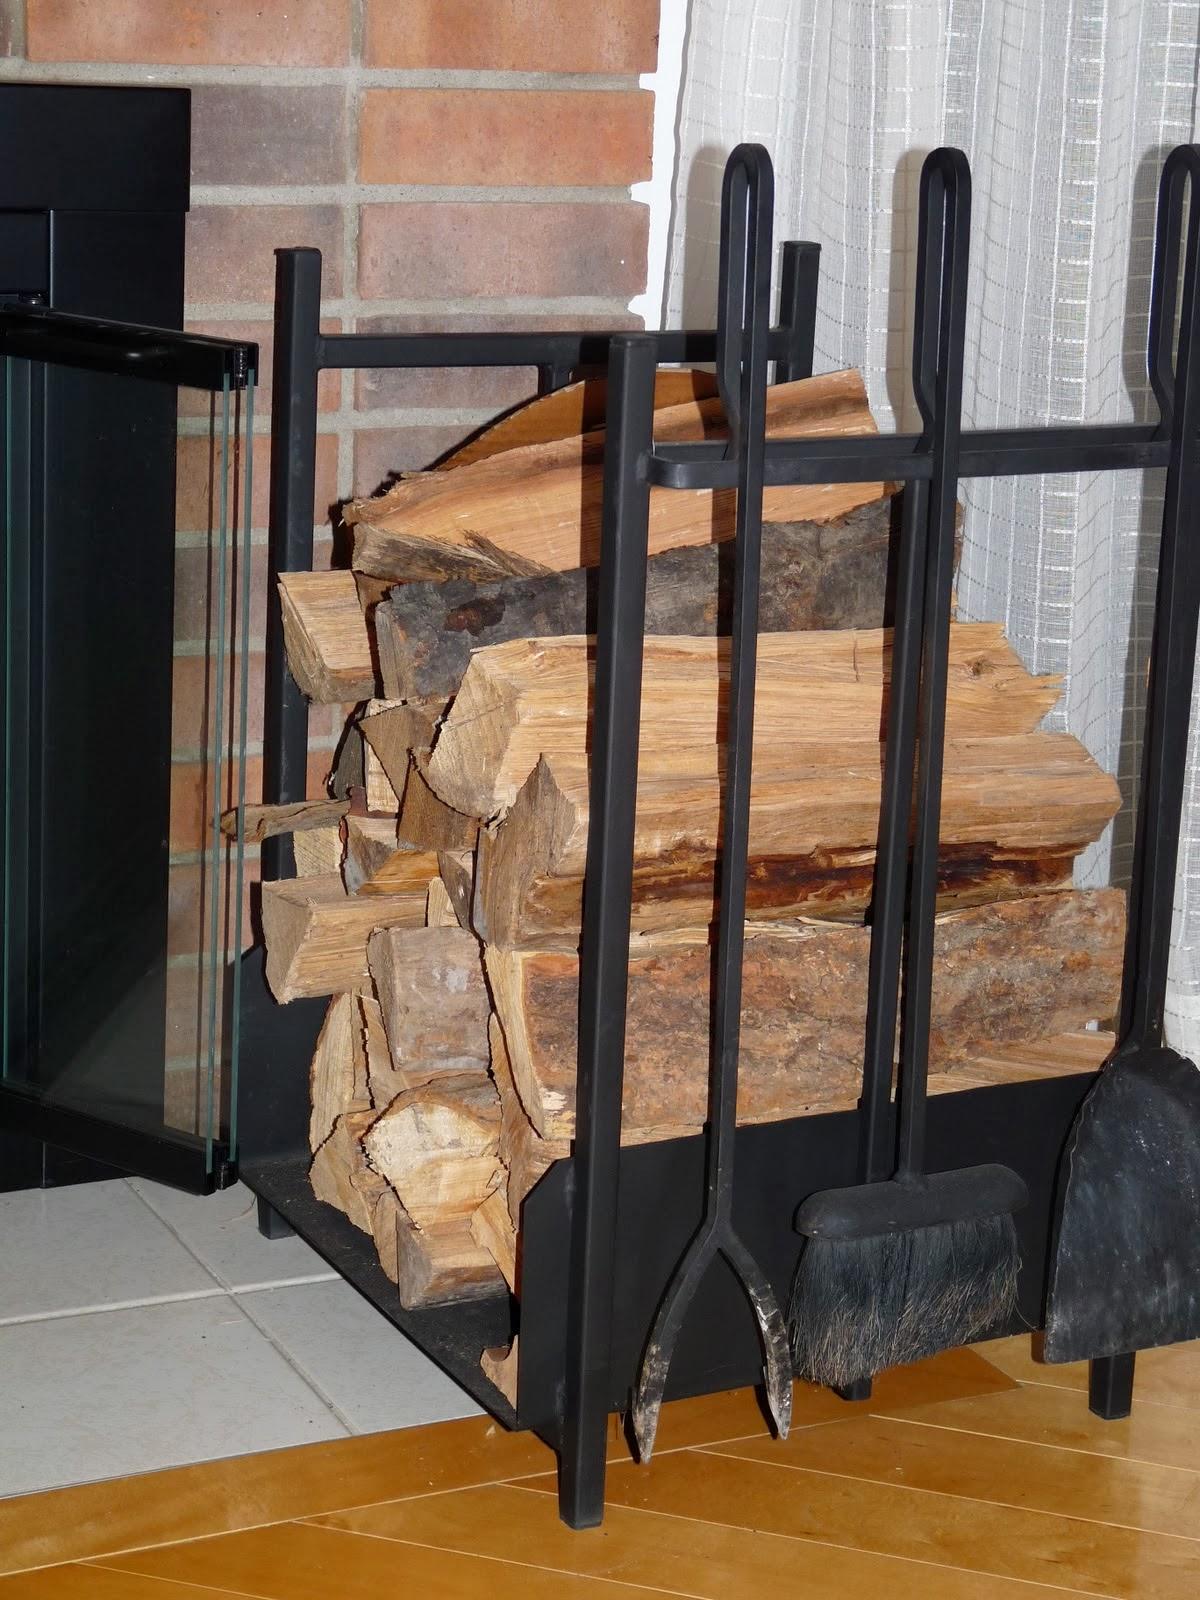 Log holder and fire poker set